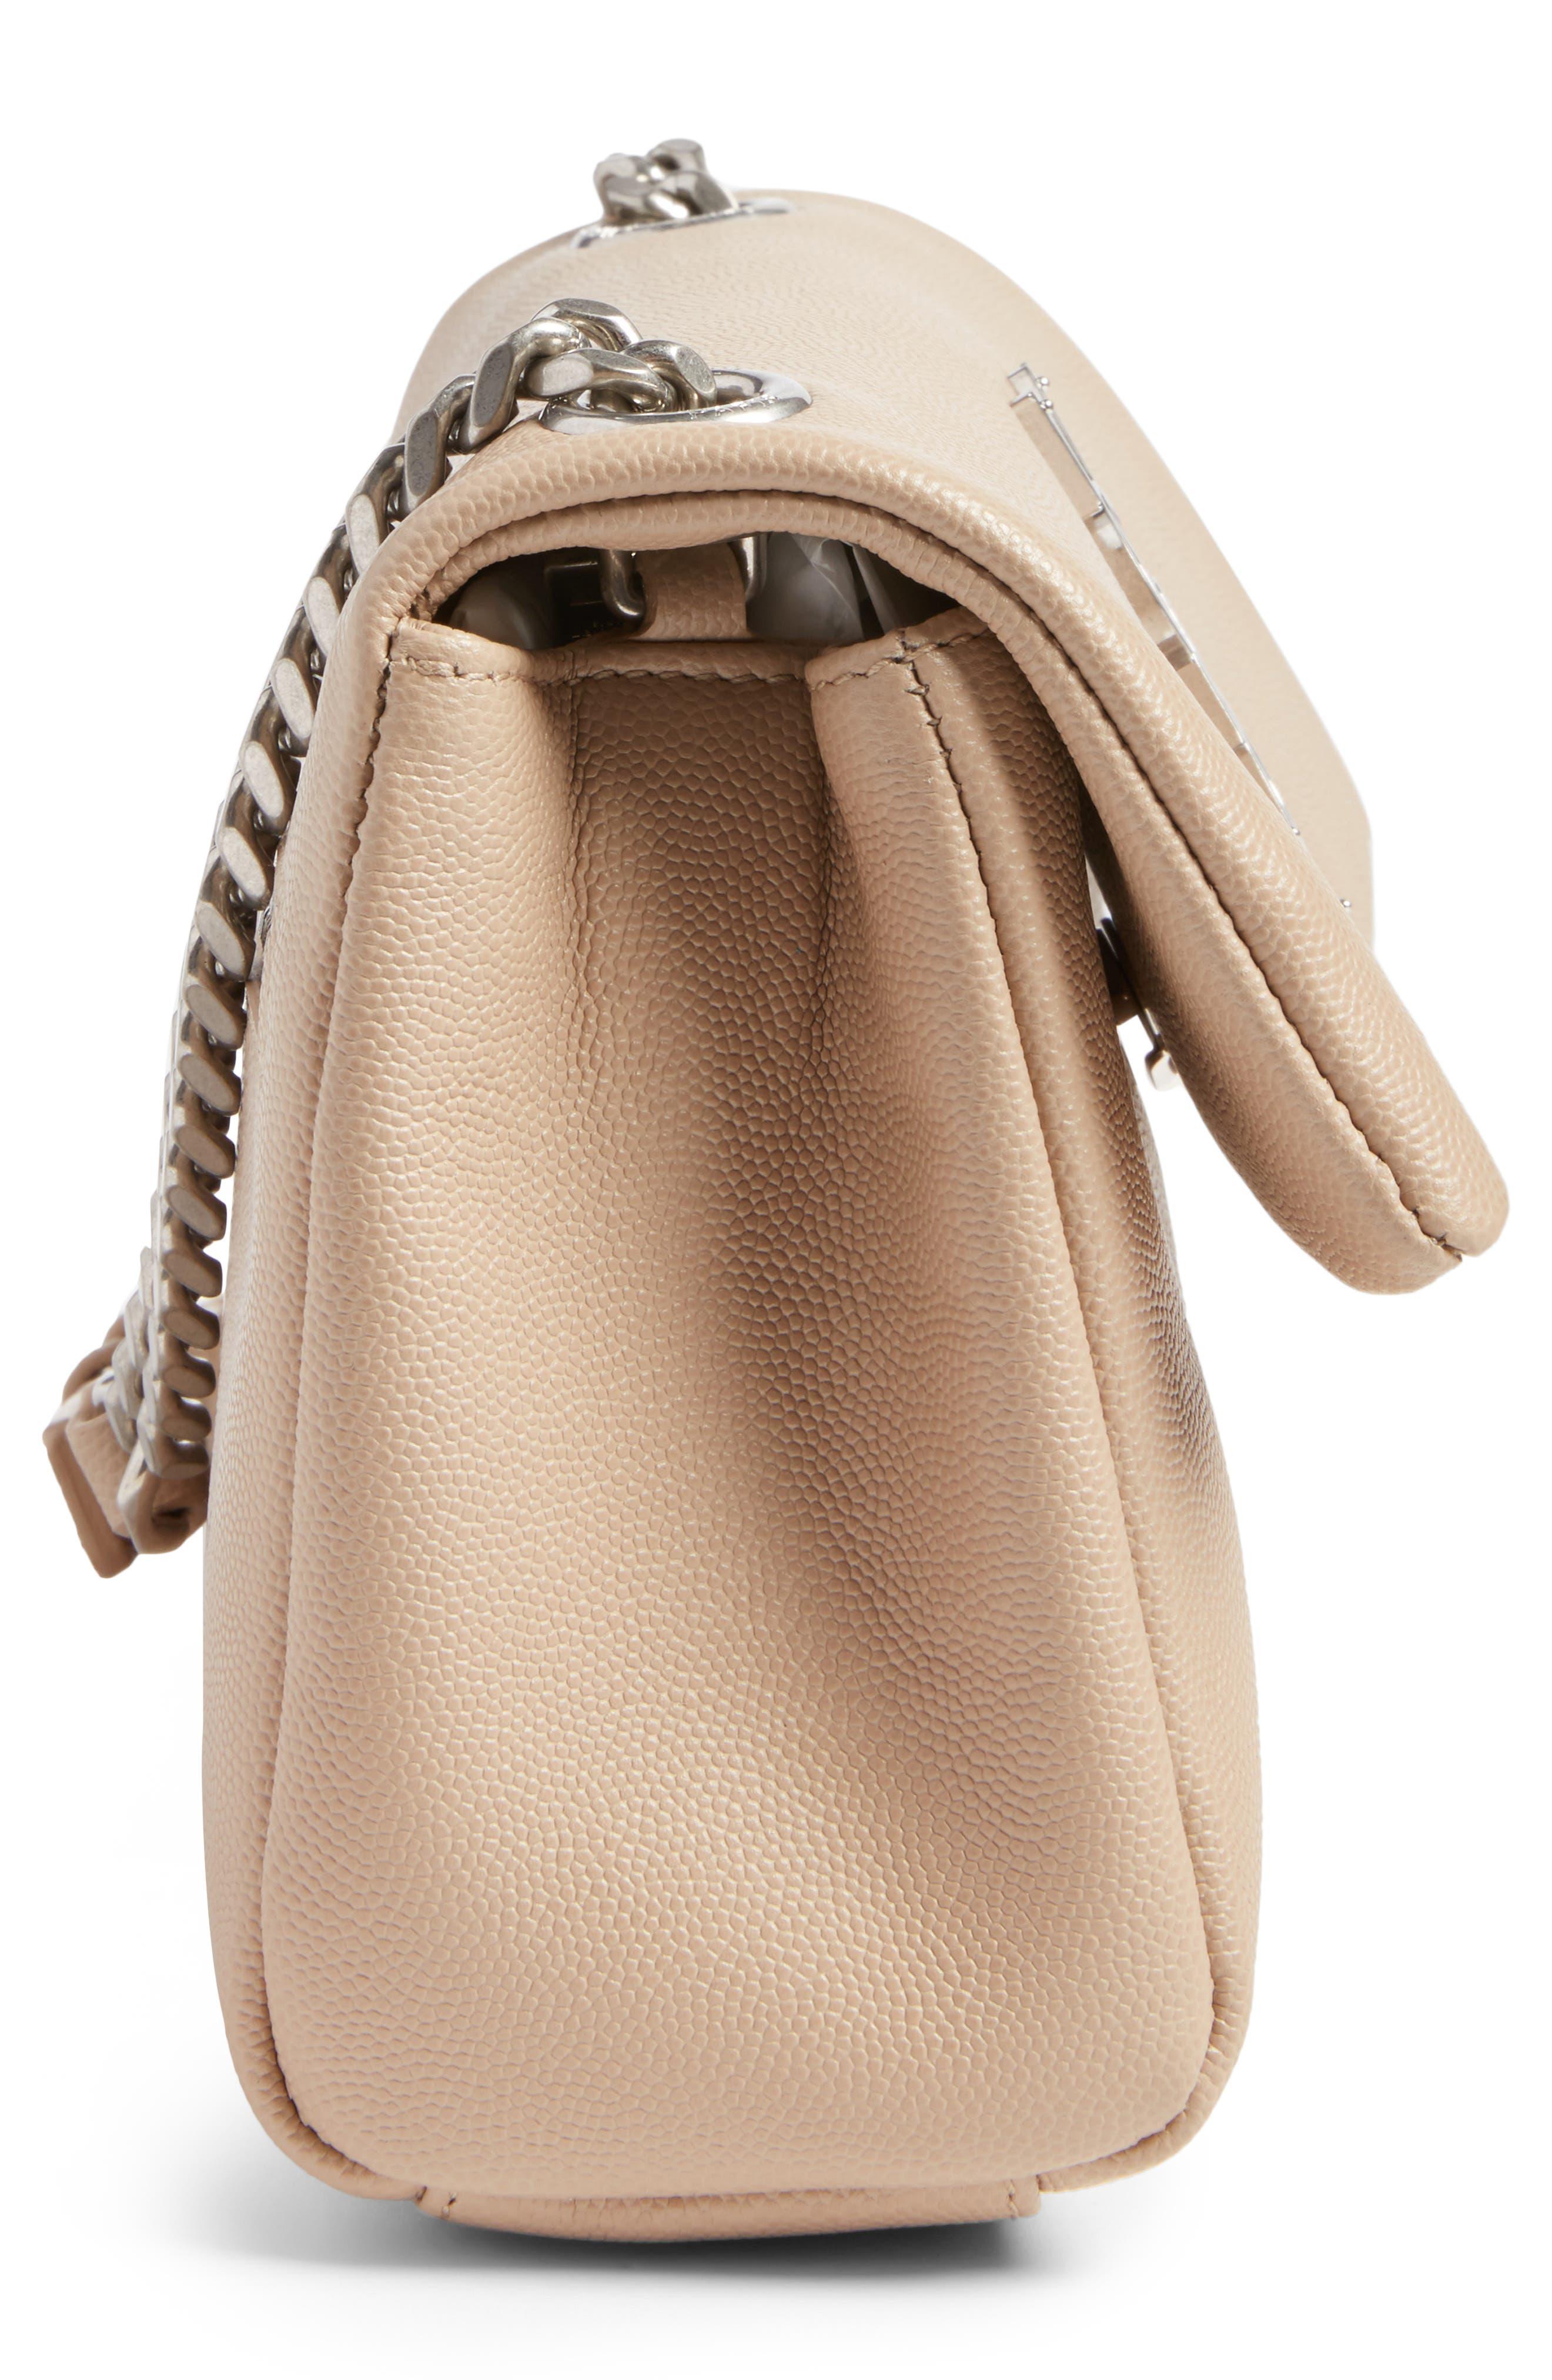 West Hollywood Calfskin Leather Messenger Bag,                             Alternate thumbnail 17, color,